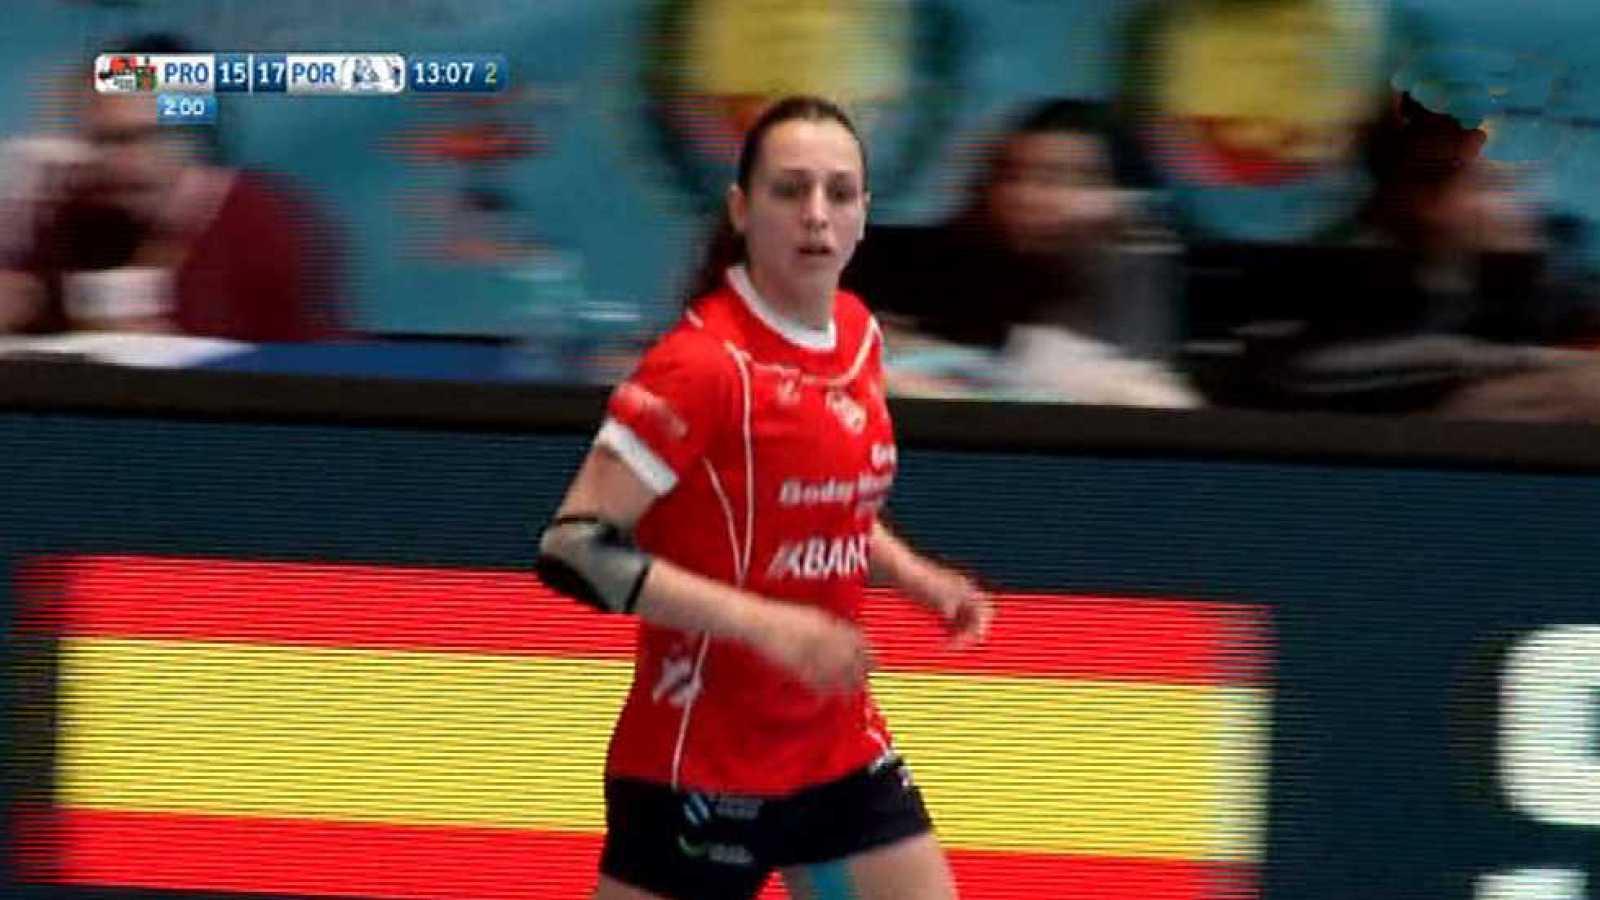 Balonmano - Copa SM La Reina. 2ª semifinal: Prosetecnisa Zuazo-B.M. Porriño - ver ahora